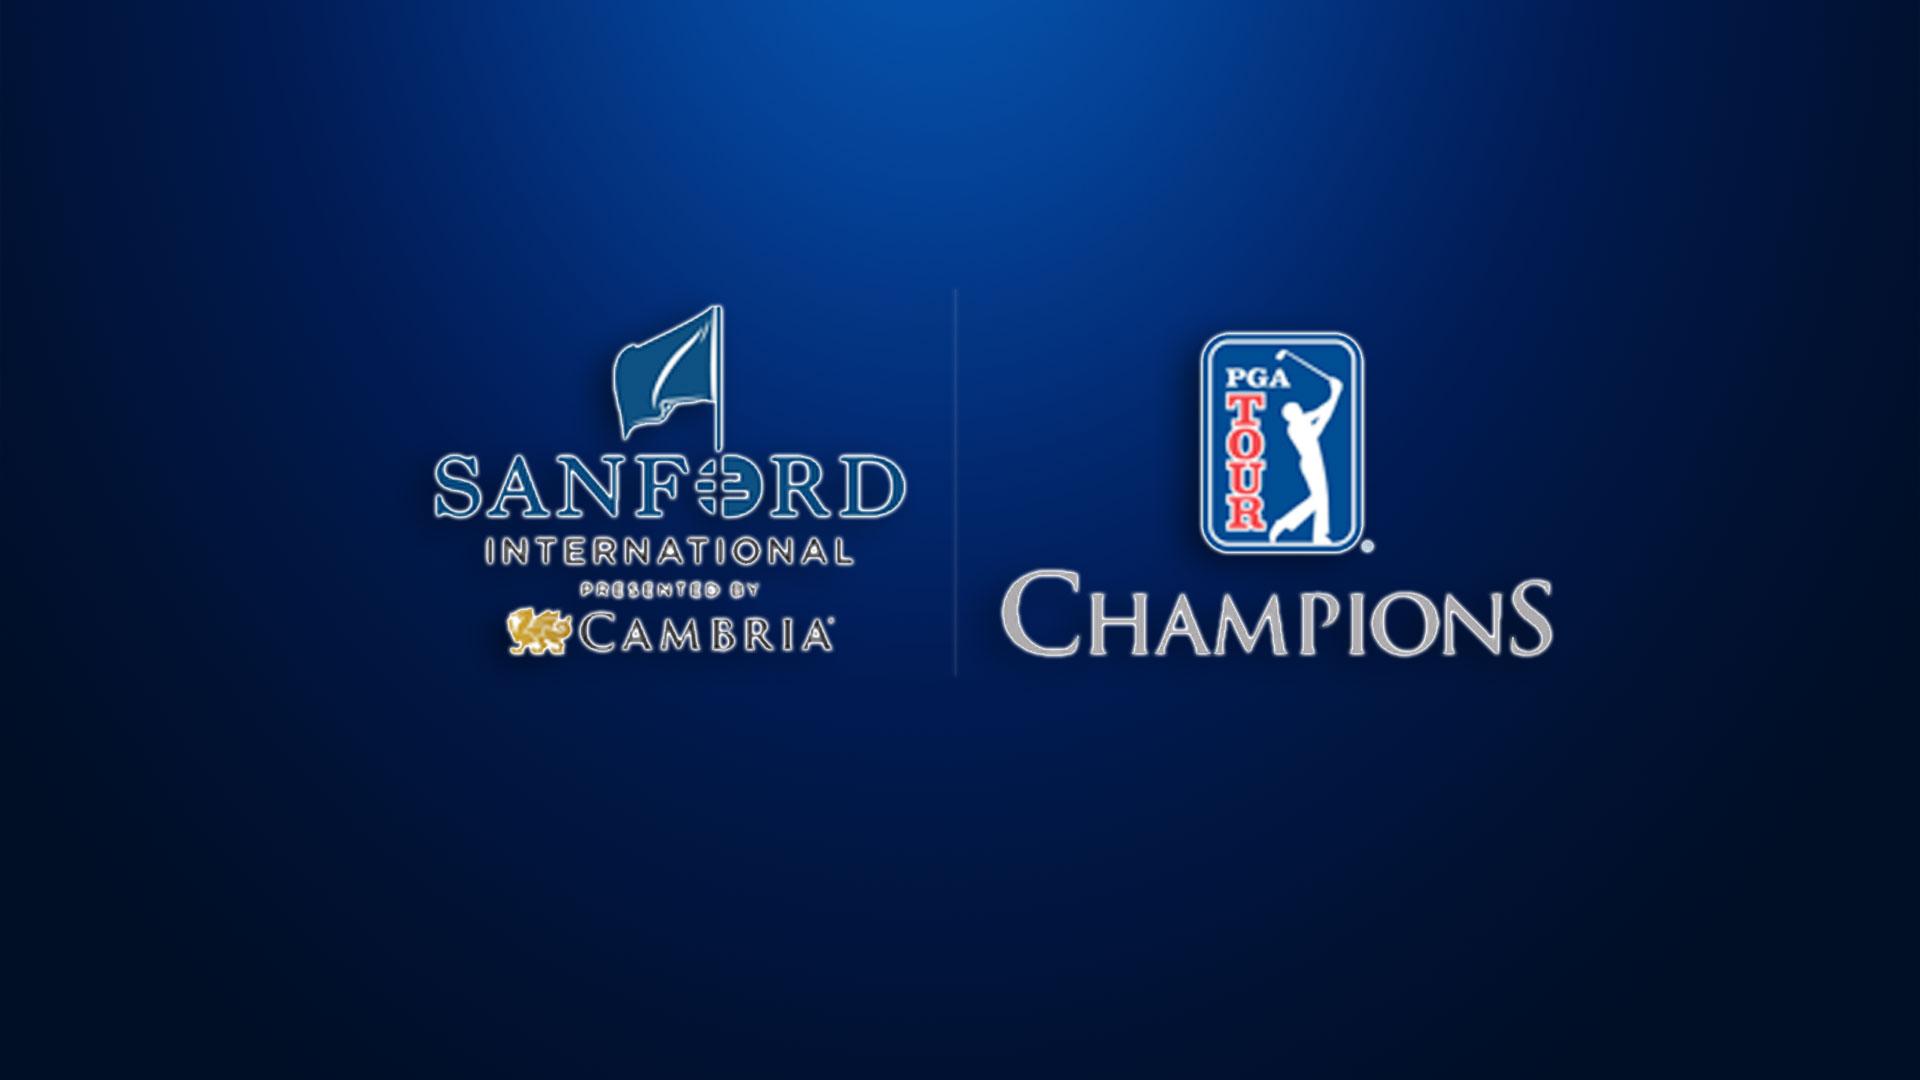 KELO Sanford International PGA champions